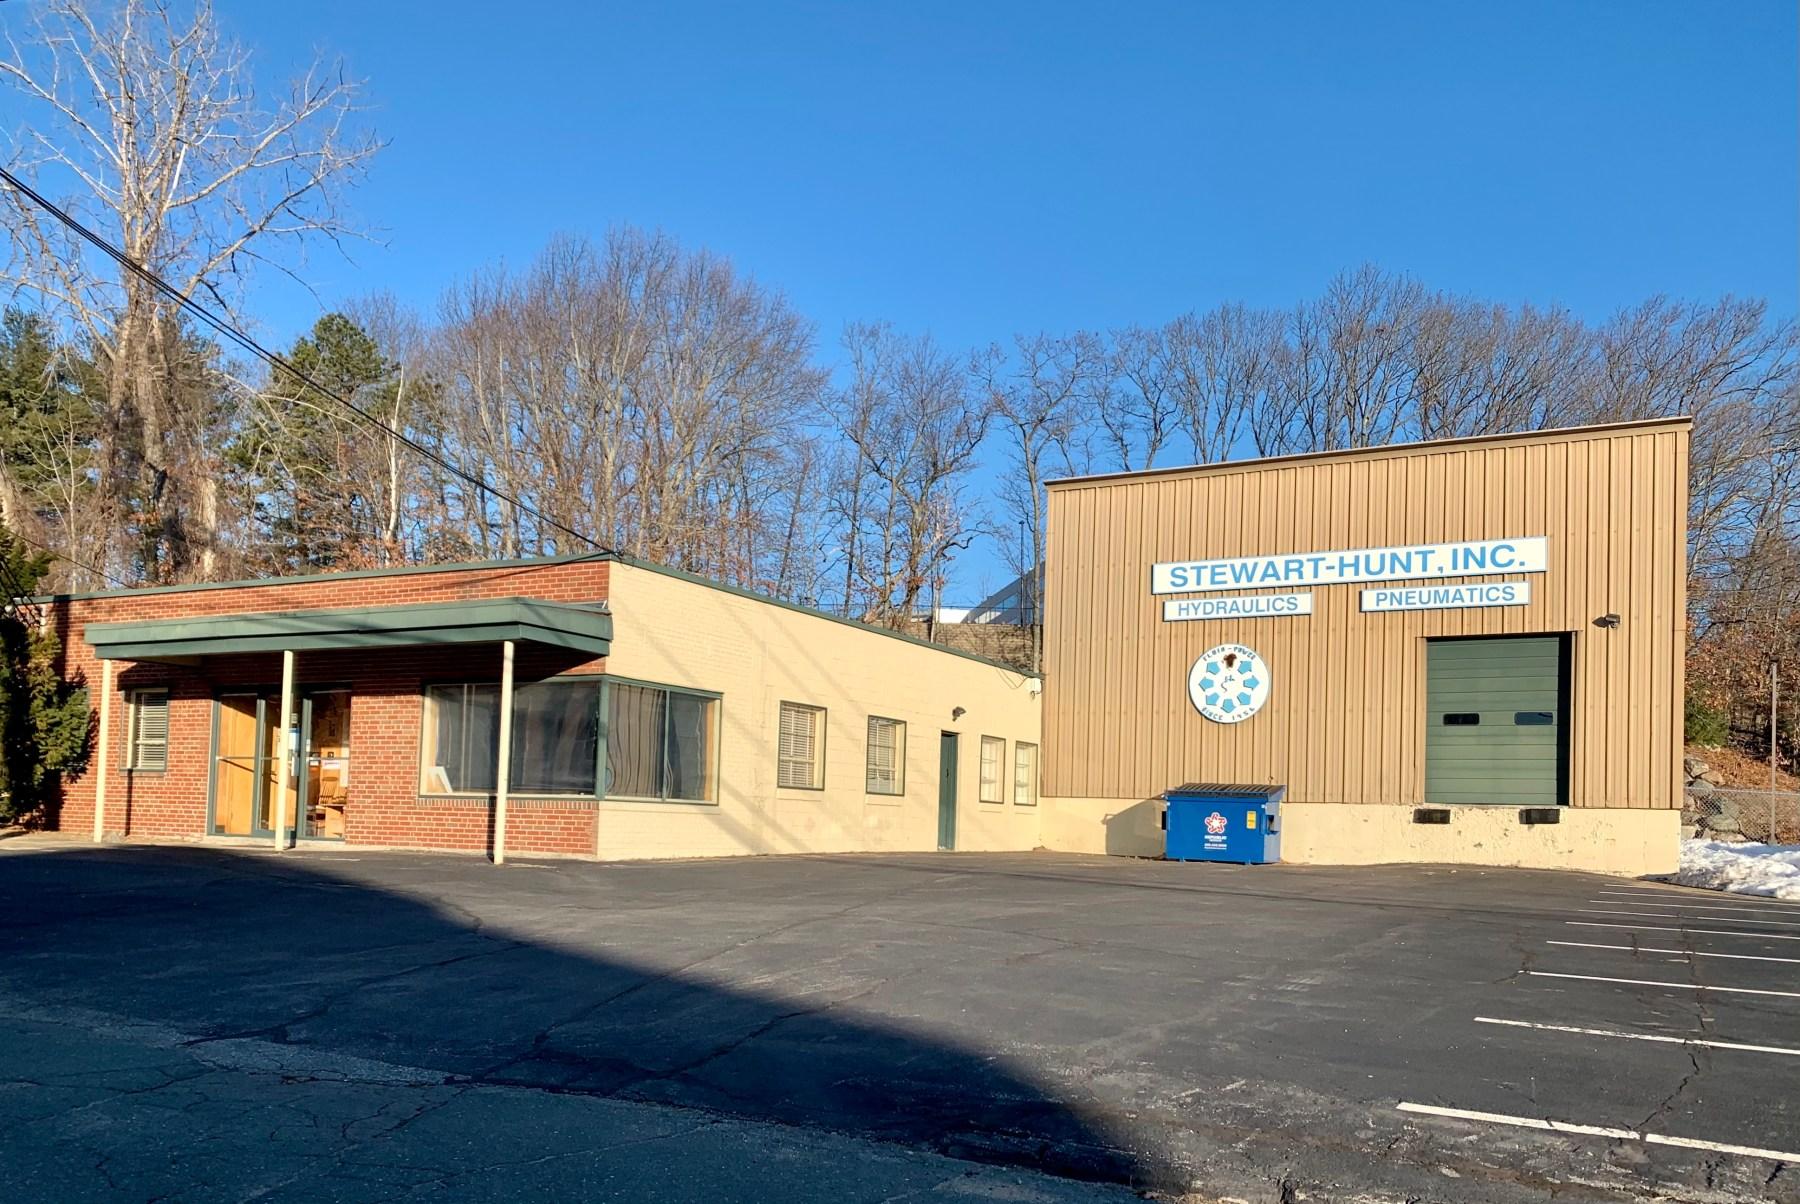 Stewart-Hunt hydraulics and pneumatics, 8 Garfield Circle, Burlington, MA